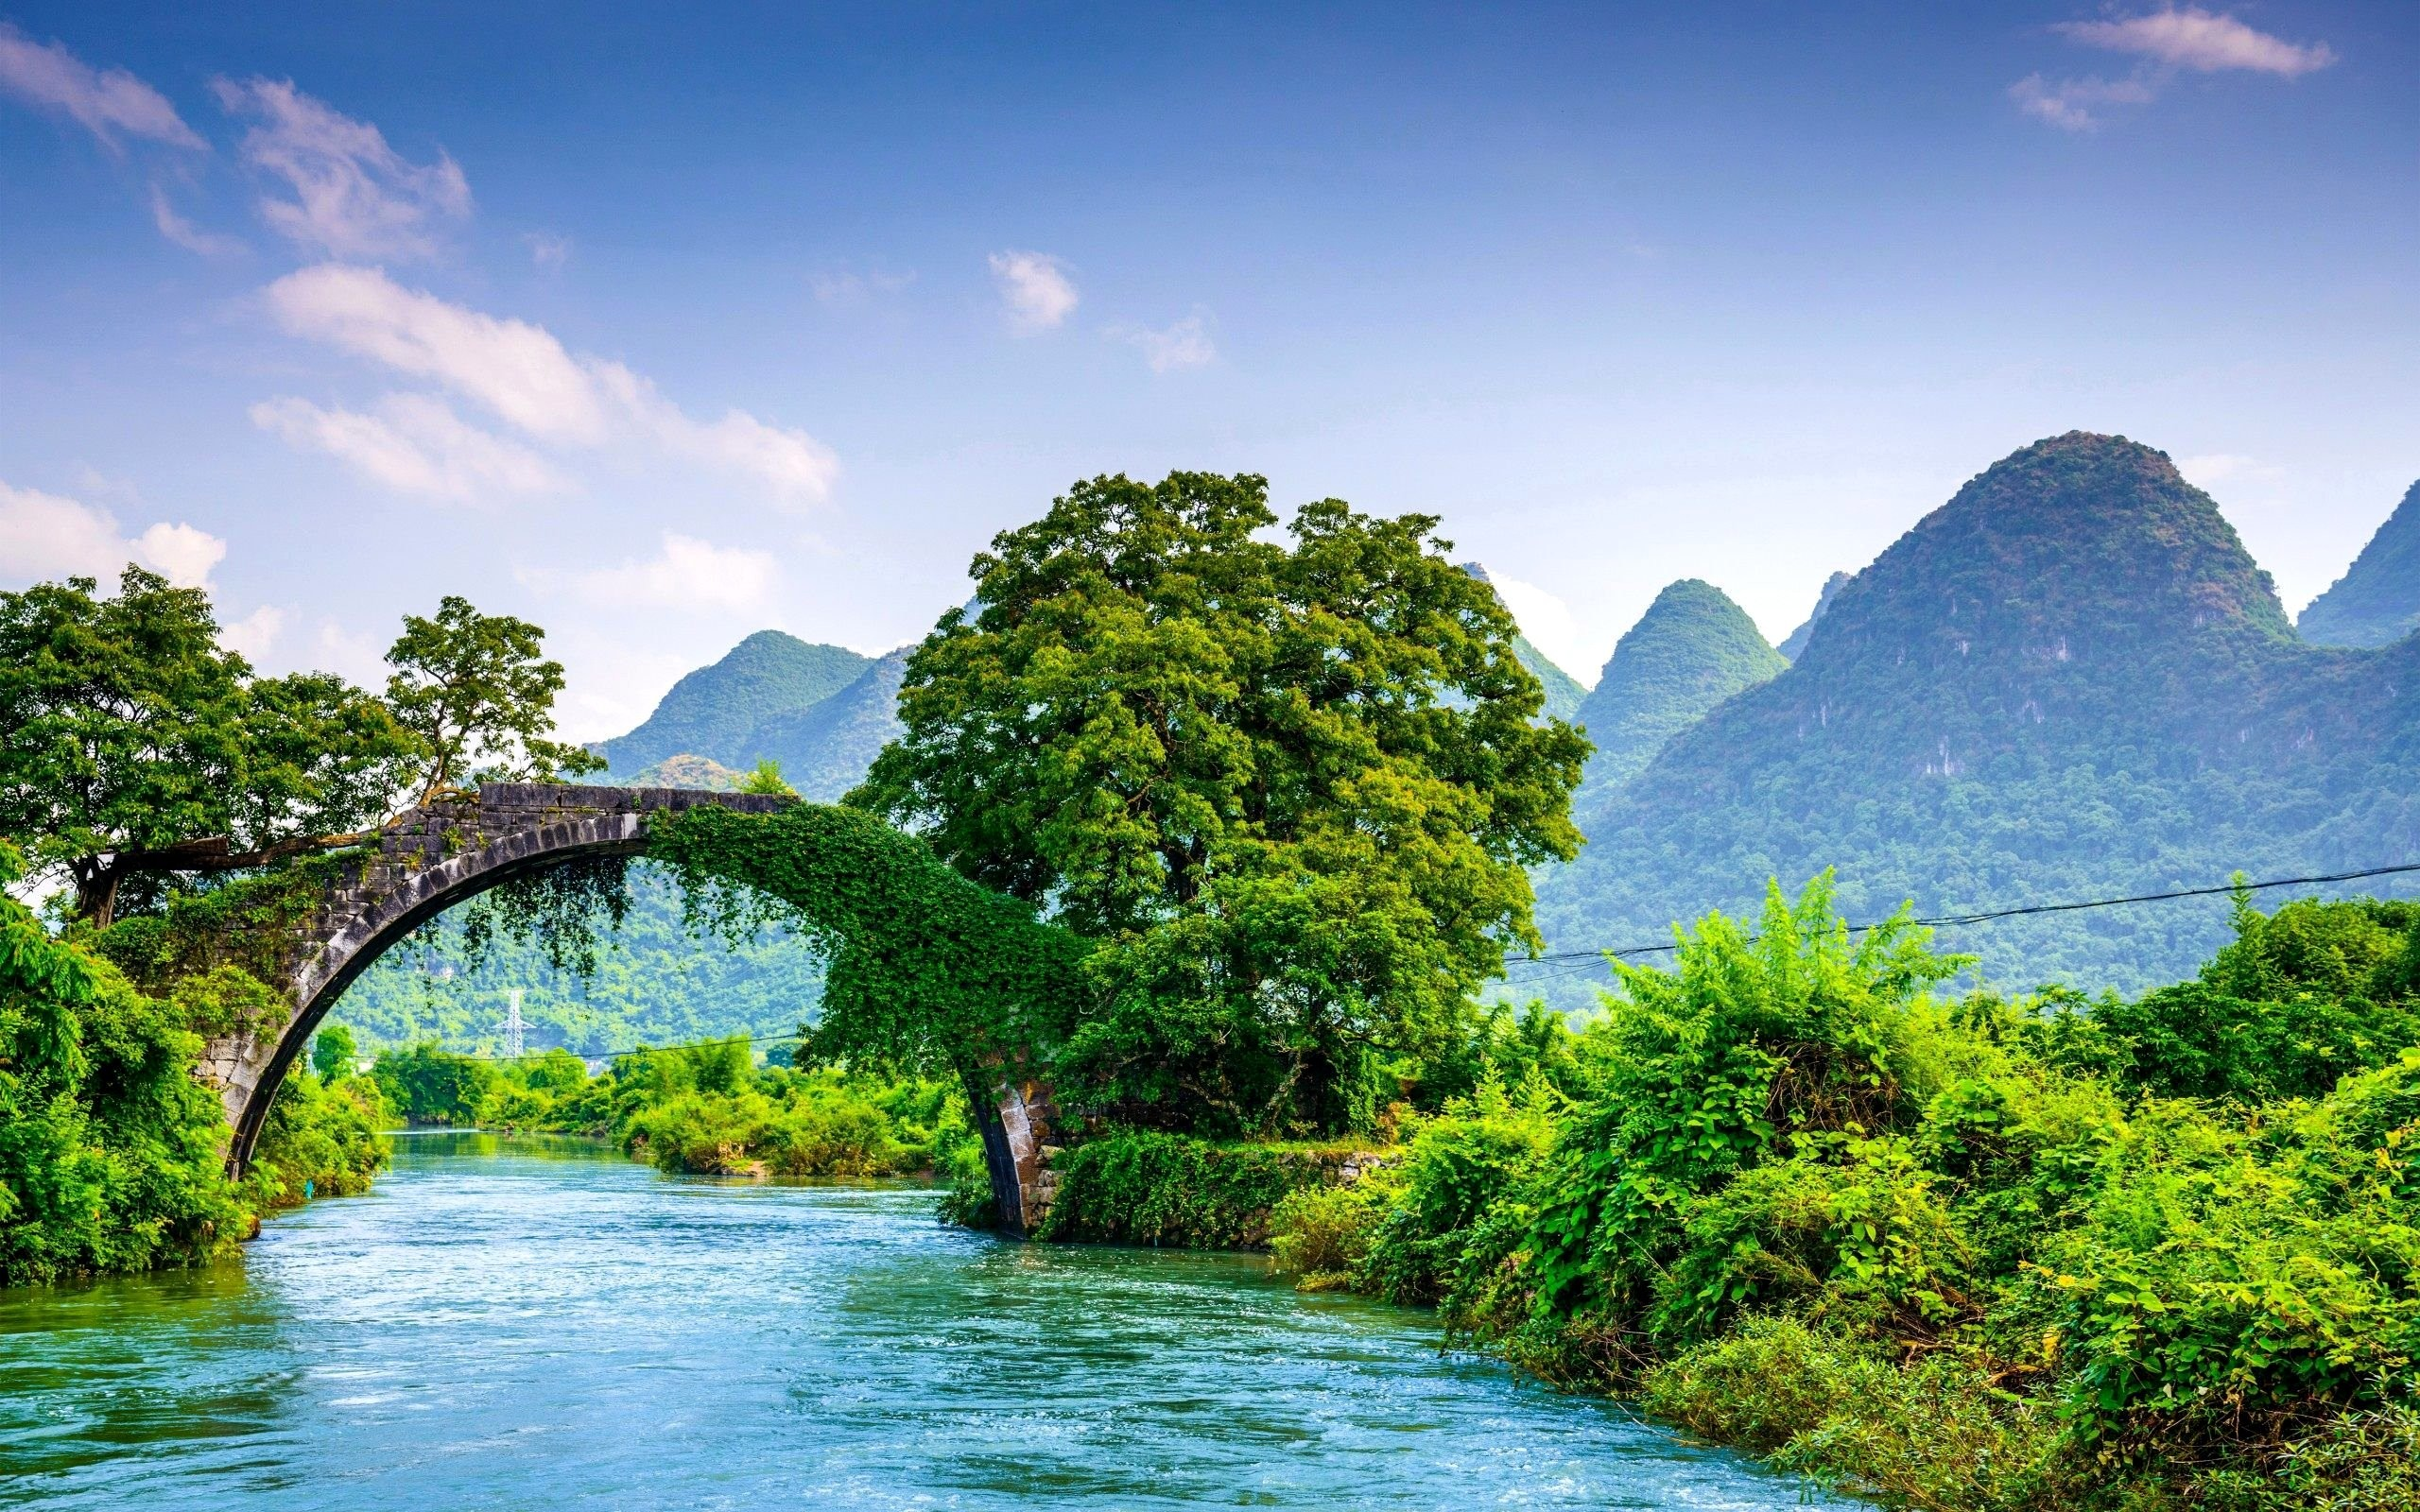 Beautiful Landscape Wallpapers Hd , HD Wallpaper & Backgrounds